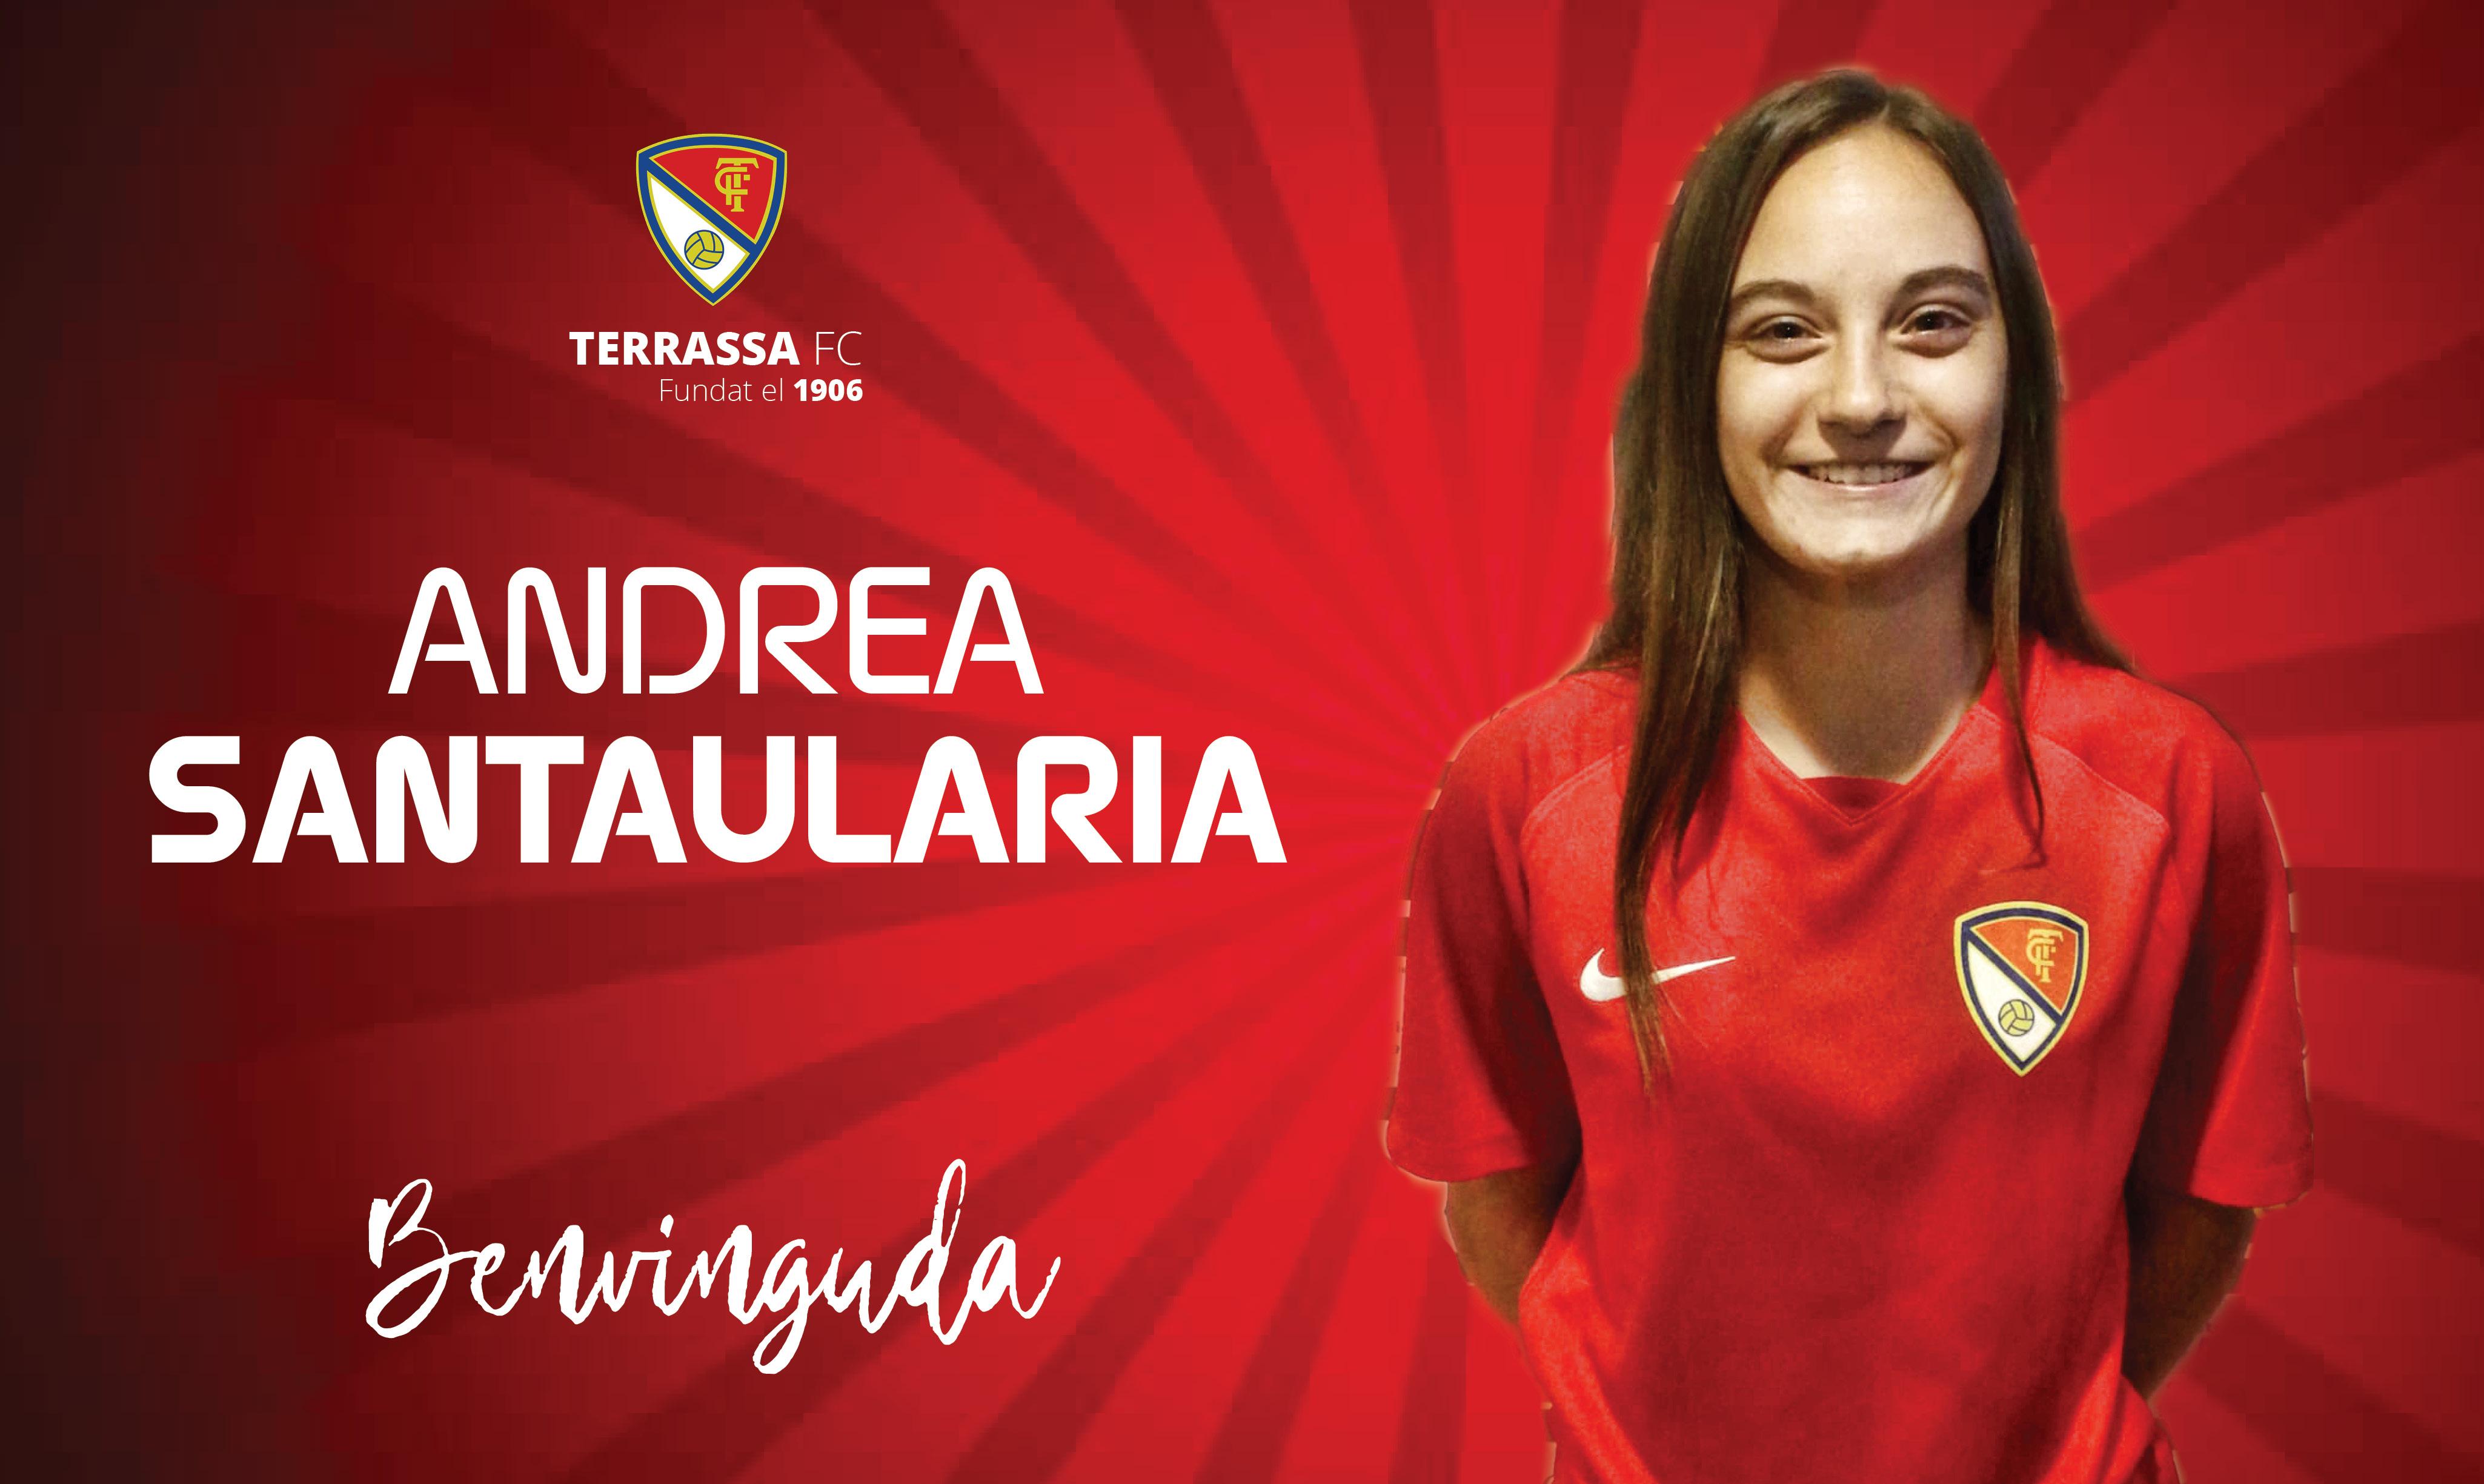 La portera Andrea Santaularia fitxa pel Terrassa FC femení